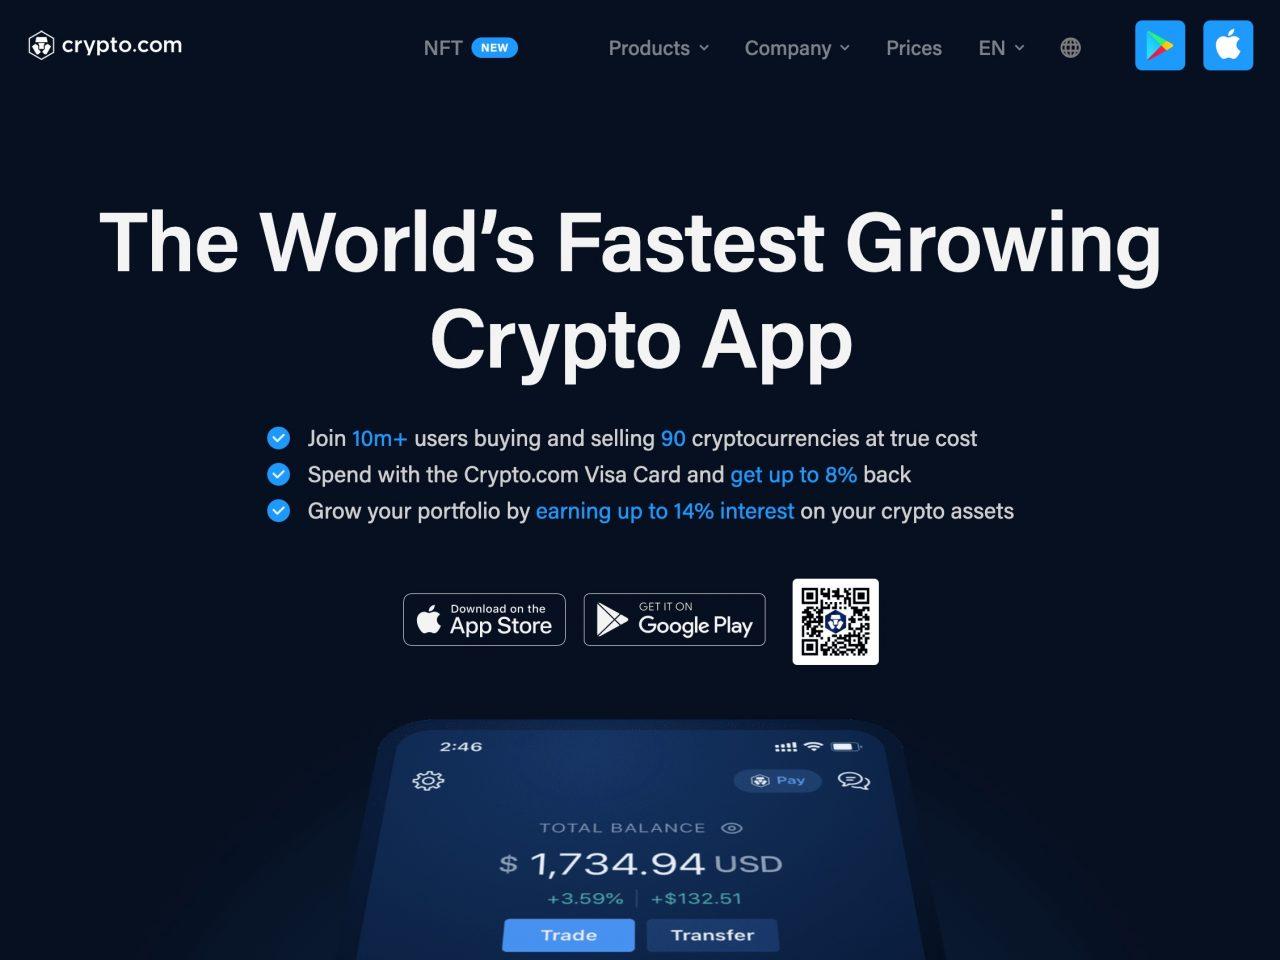 https://goodkarma.capital/wp-content/uploads/2021/06/Crypto-com-1280x960.jpg